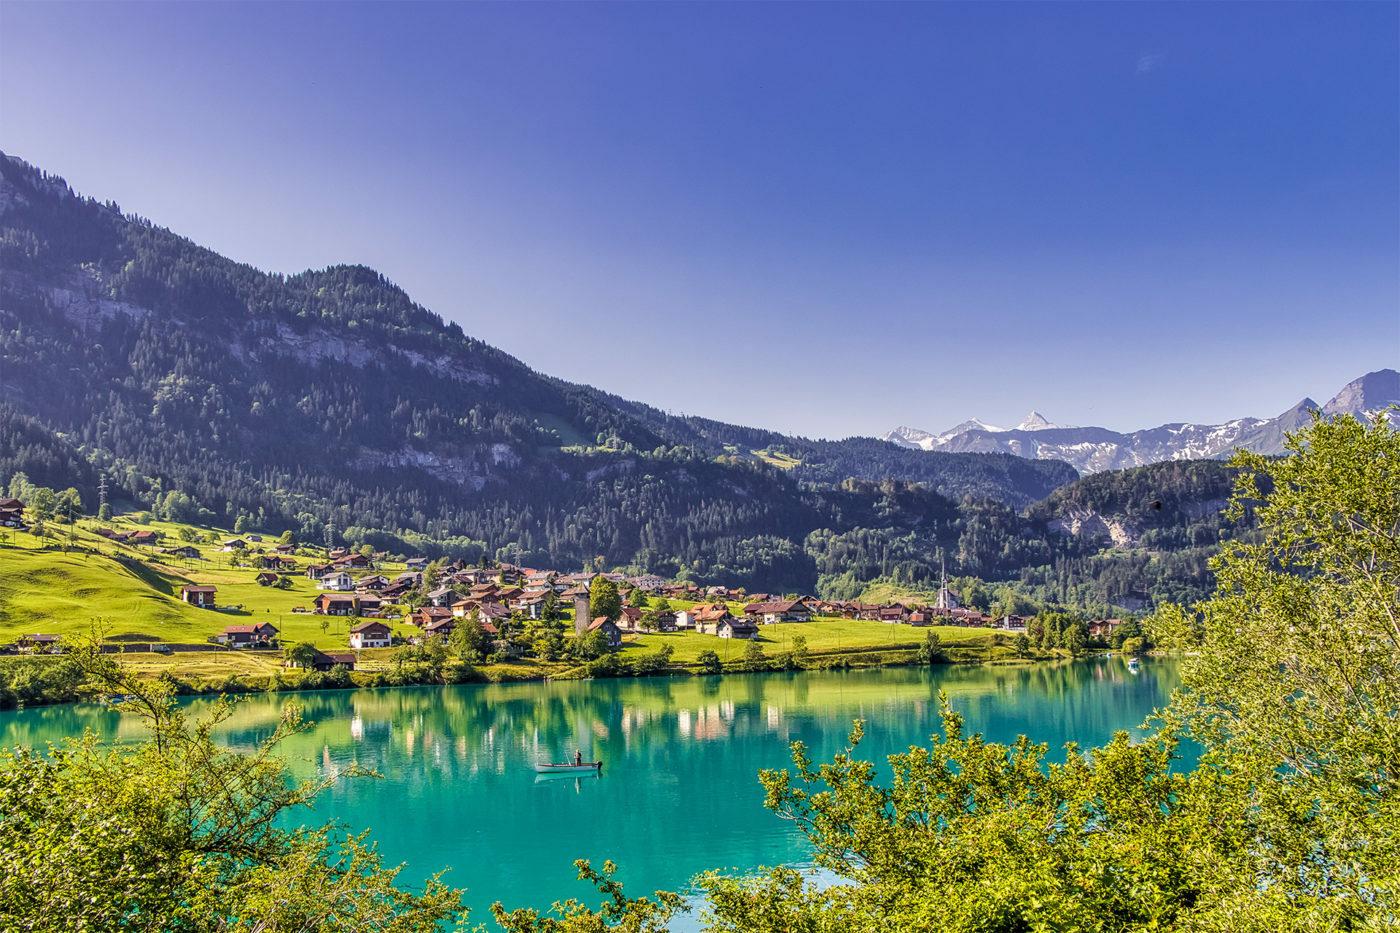 American University in Switzerland Image